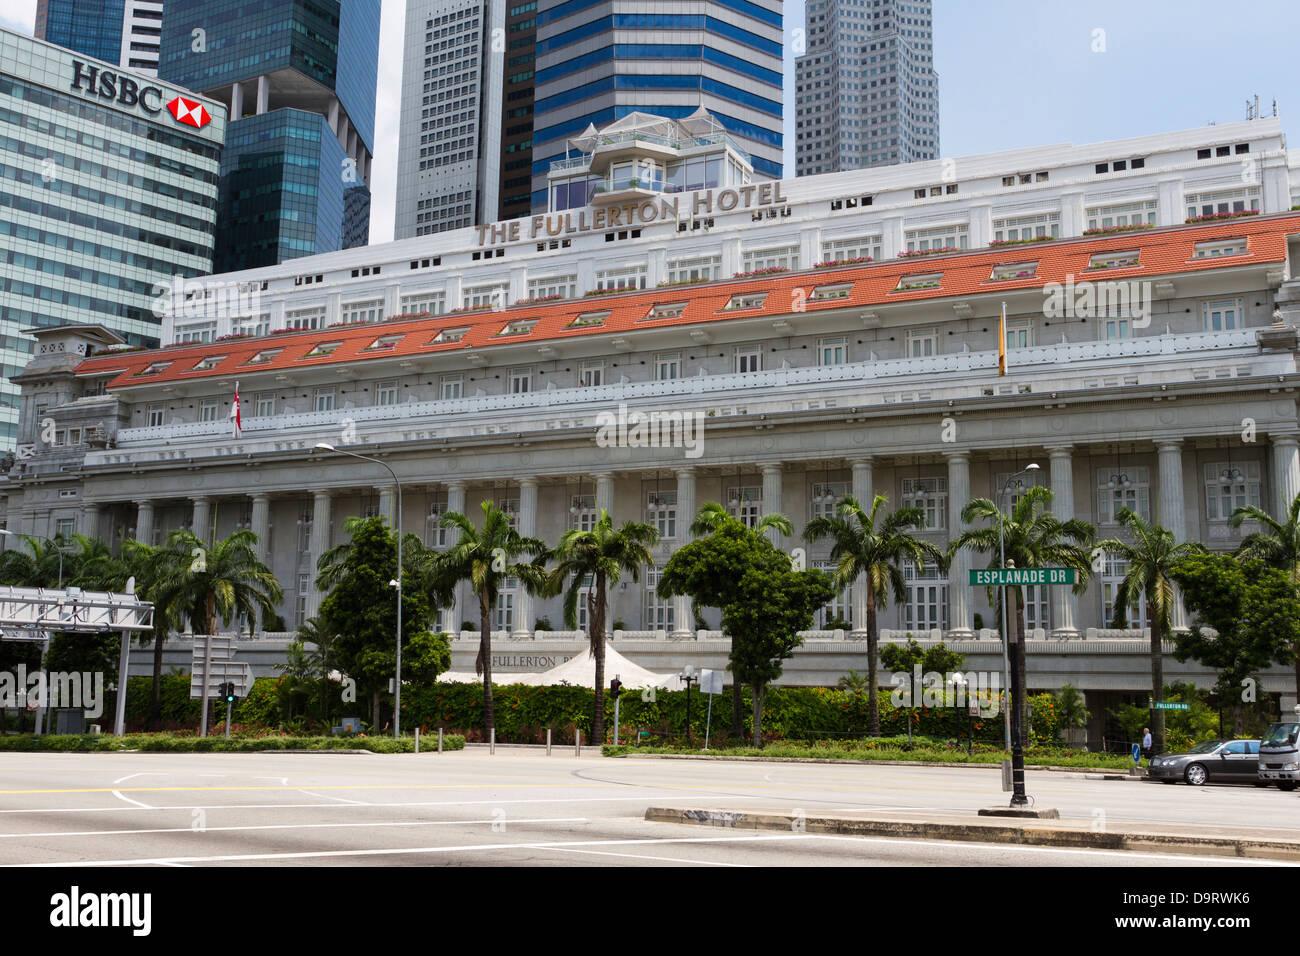 Fullerton Bay Hotel, Singapore, Asia - Stock Image